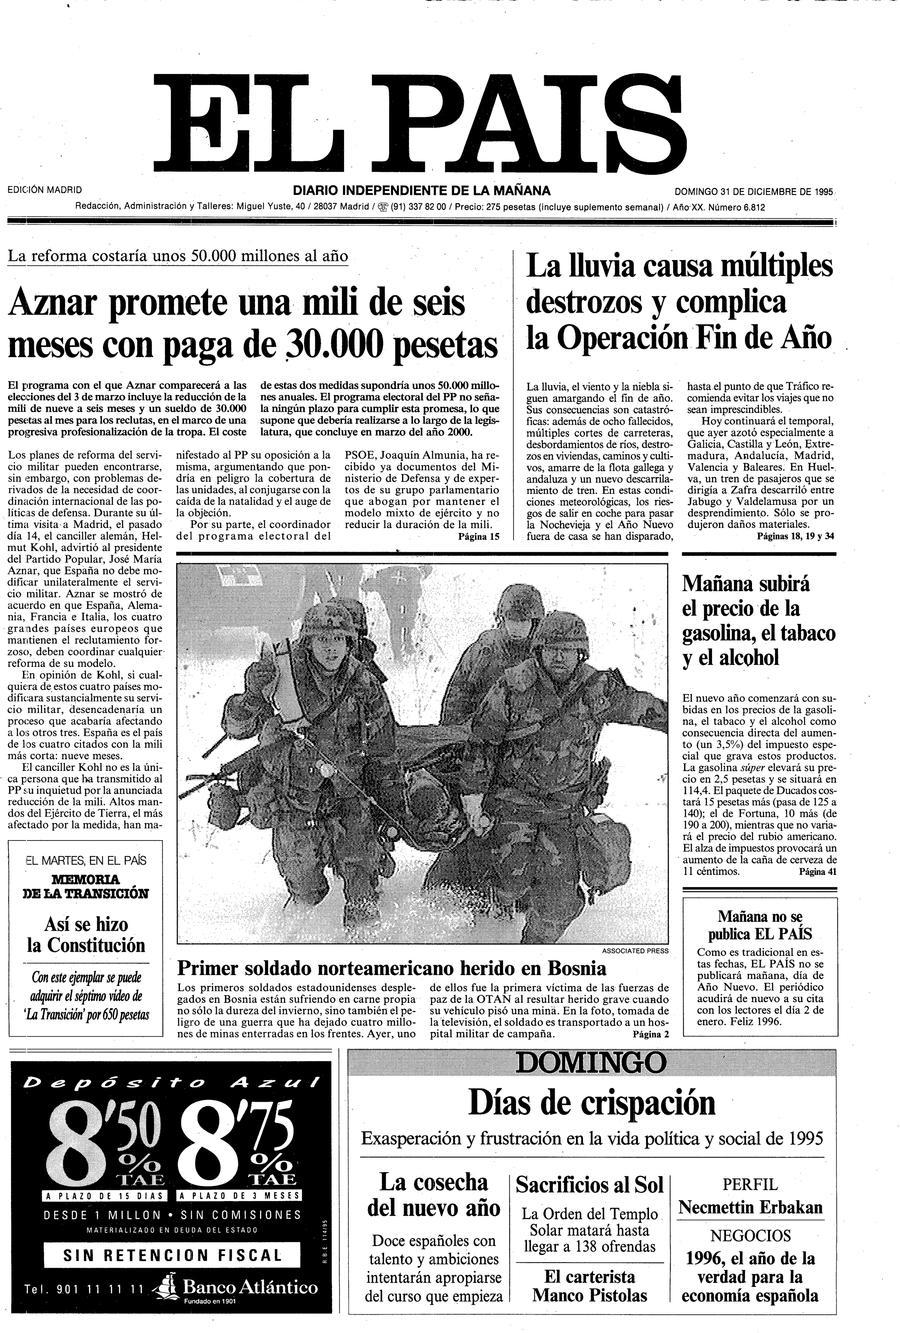 31 de Diciembre de 1995